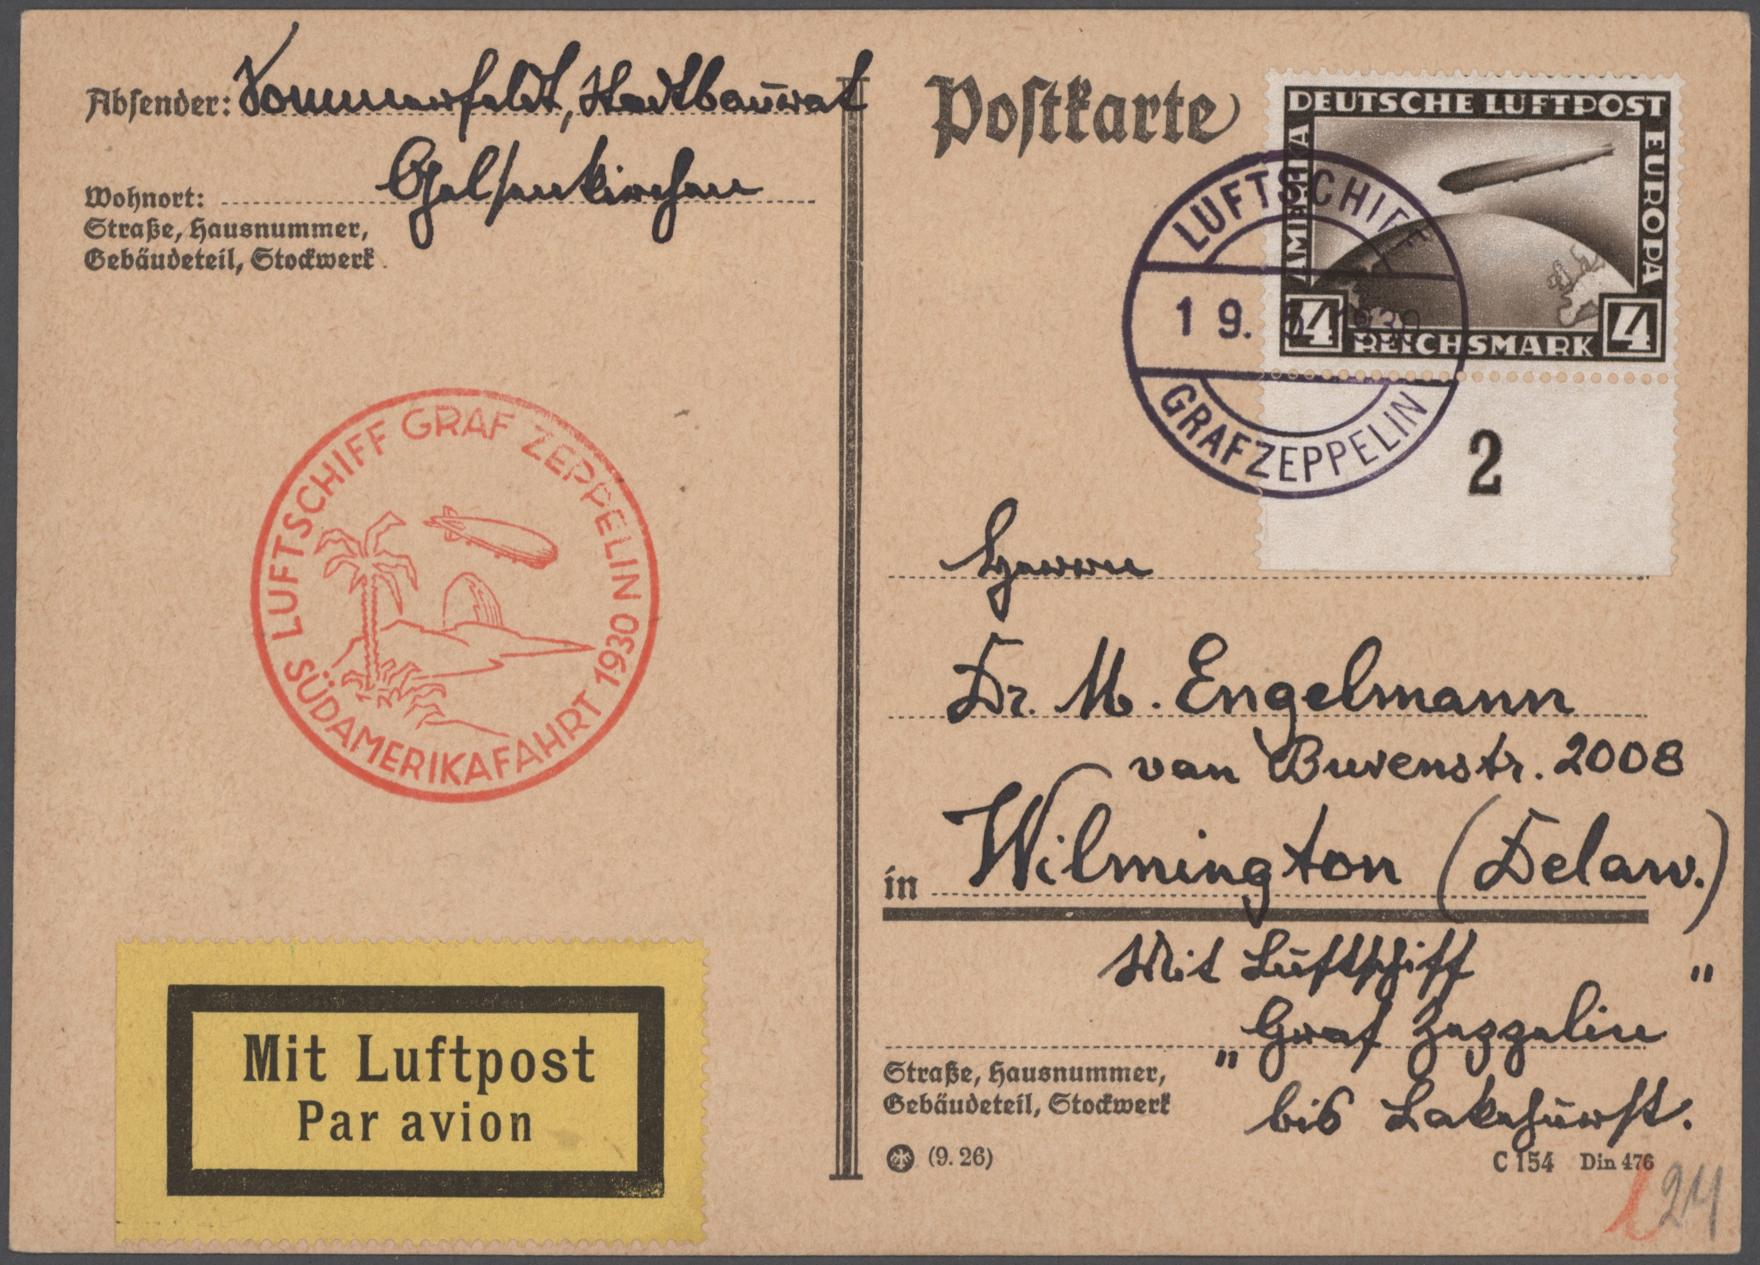 Lot 26119 - nachlässe  -  Auktionshaus Christoph Gärtner GmbH & Co. KG Sale #46 Gollcetions Germany - including the suplement